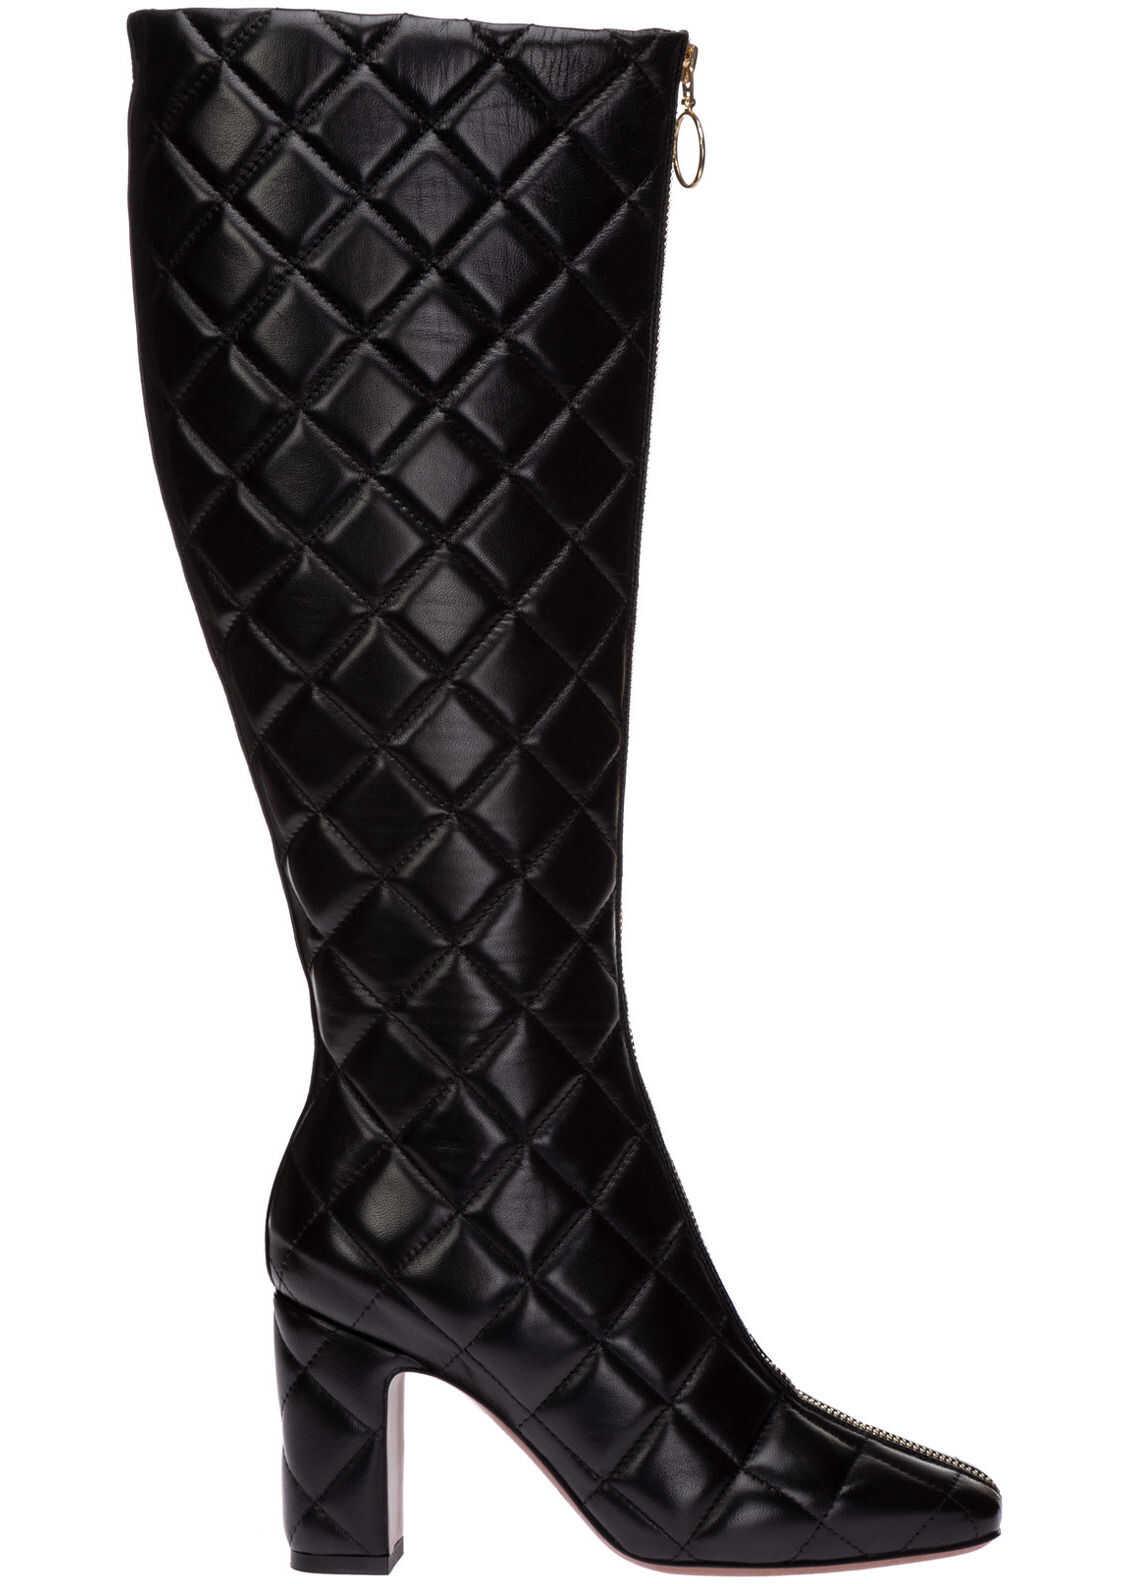 L'Autre Chose Heel Boots LDM089.85WP26151001 Black imagine b-mall.ro